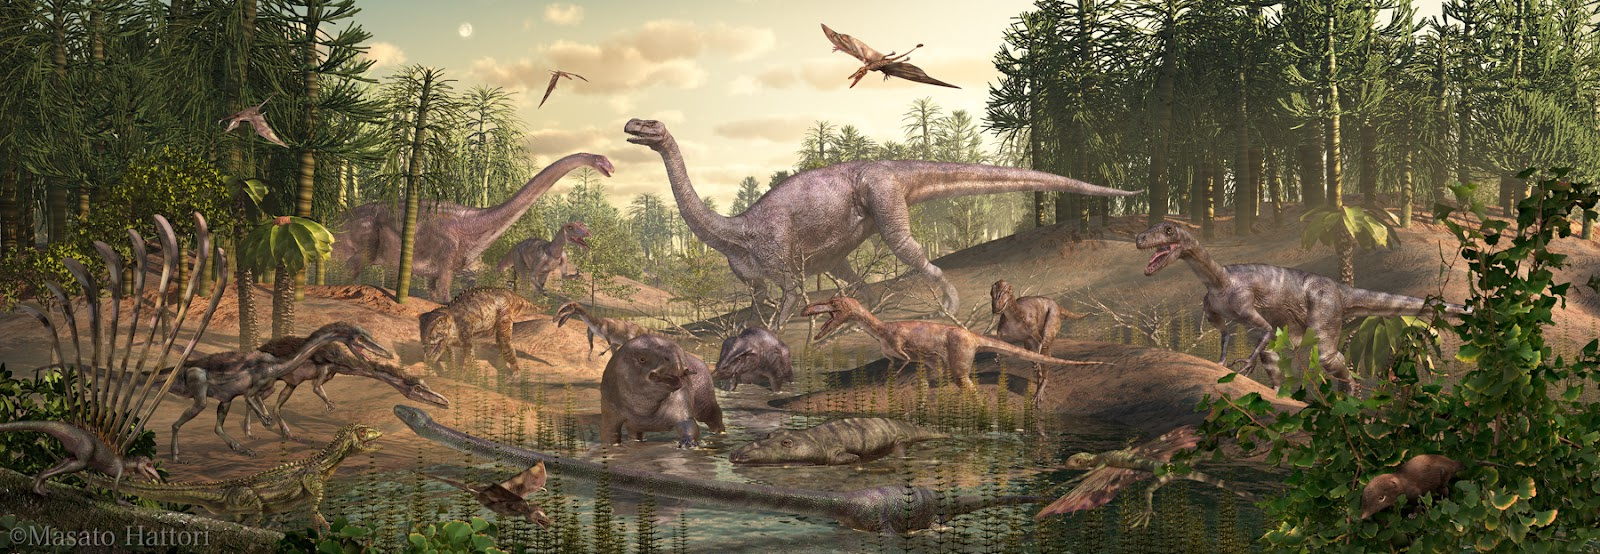 the triassic jurassic